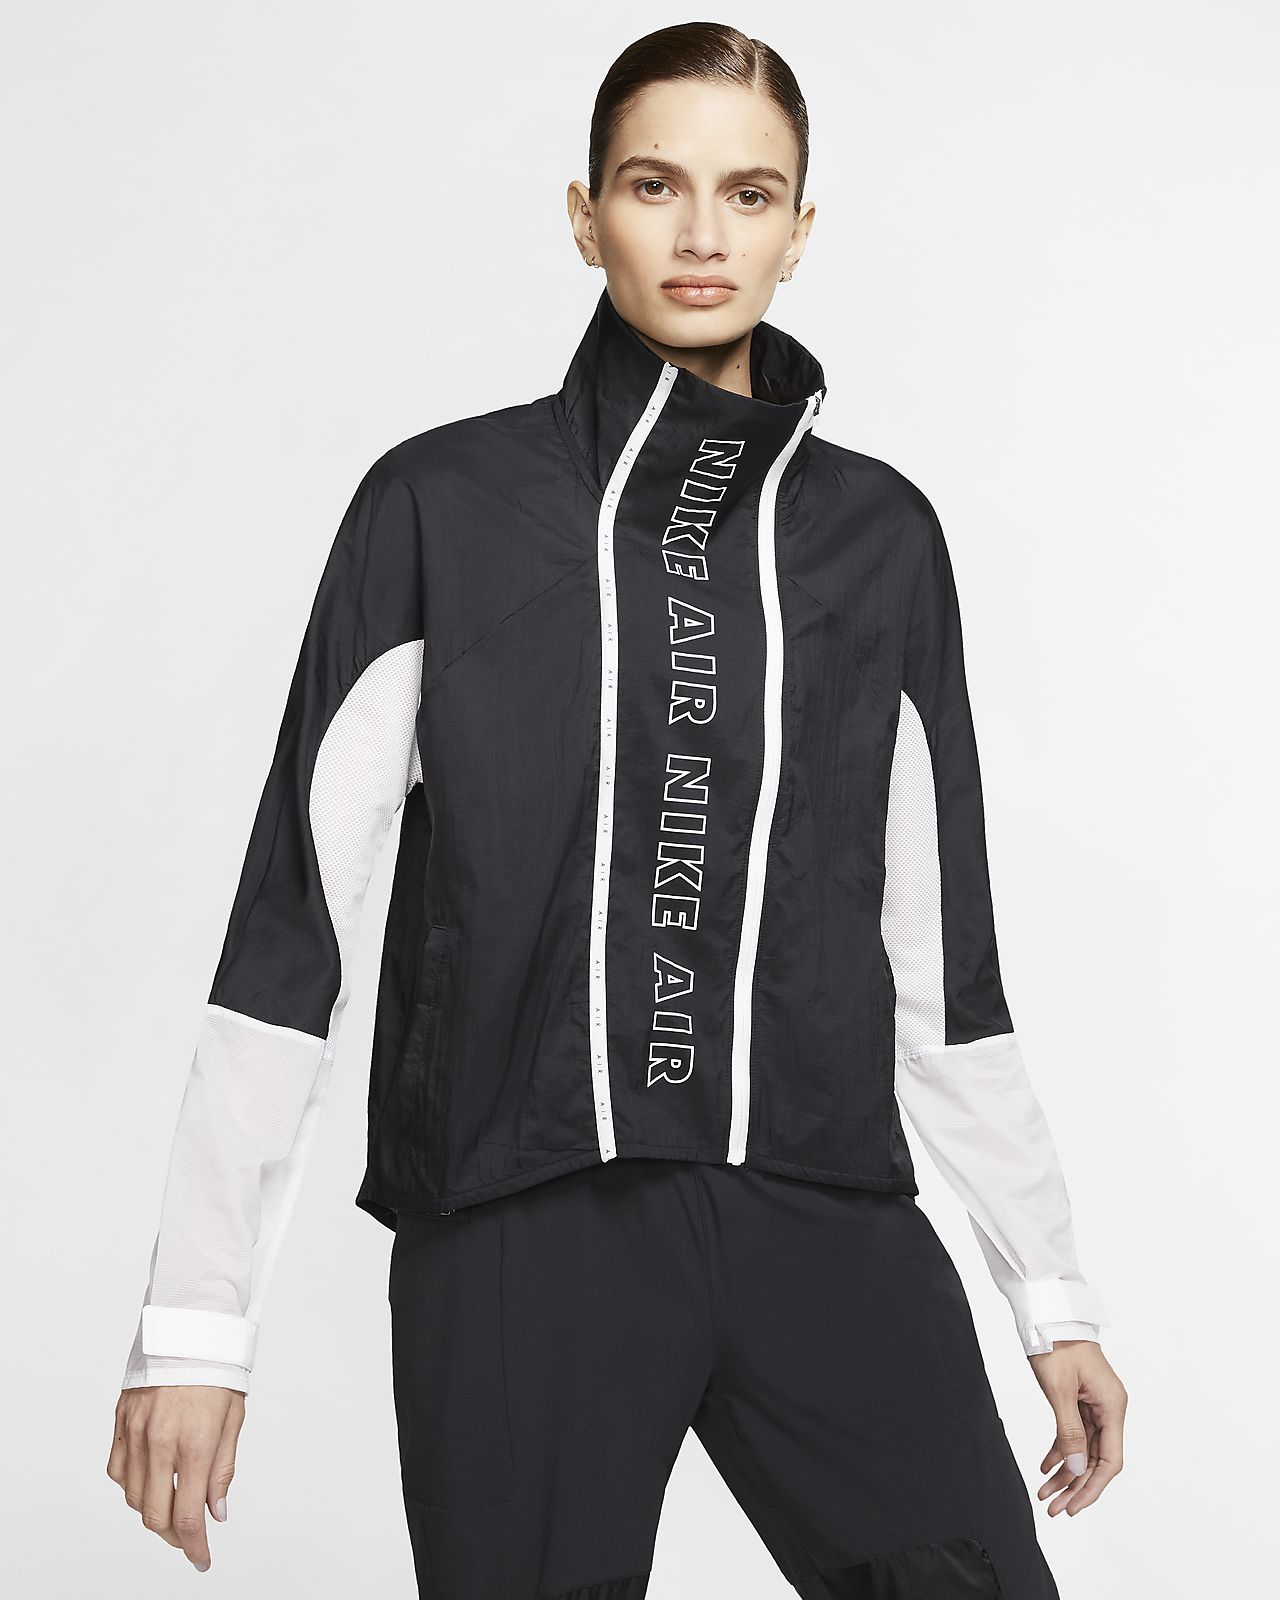 Nueva llegada 2014 Flower Printed Jacket Women europea y